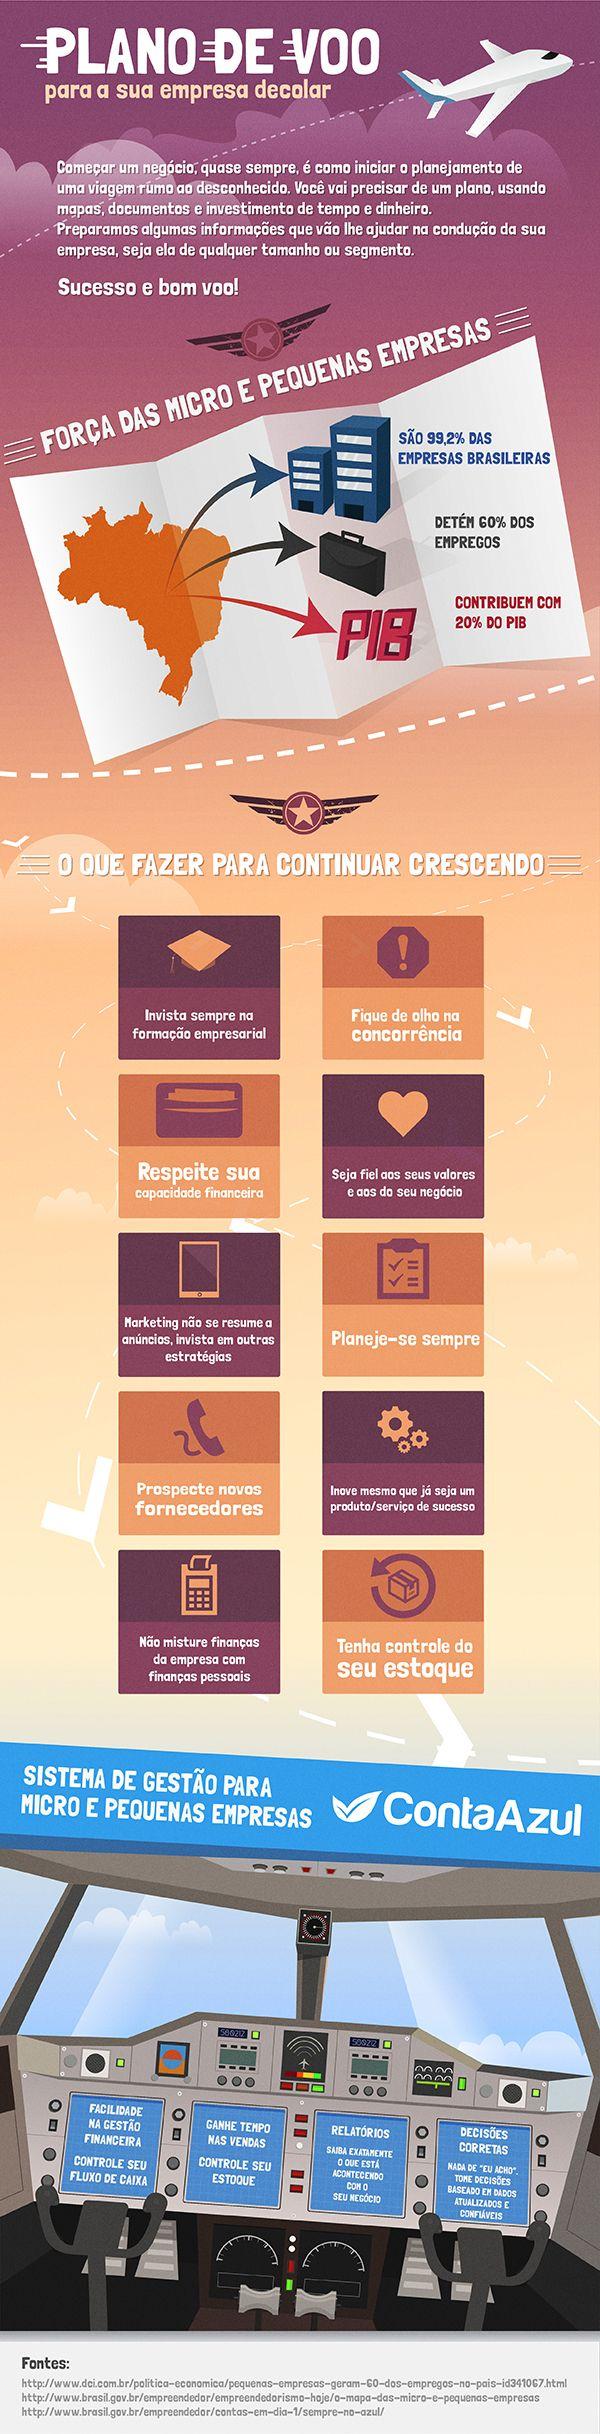 Infográfico: Dicas para sua empresa decolar #empreendedorismo #infografico #infographic #entrepreneurship